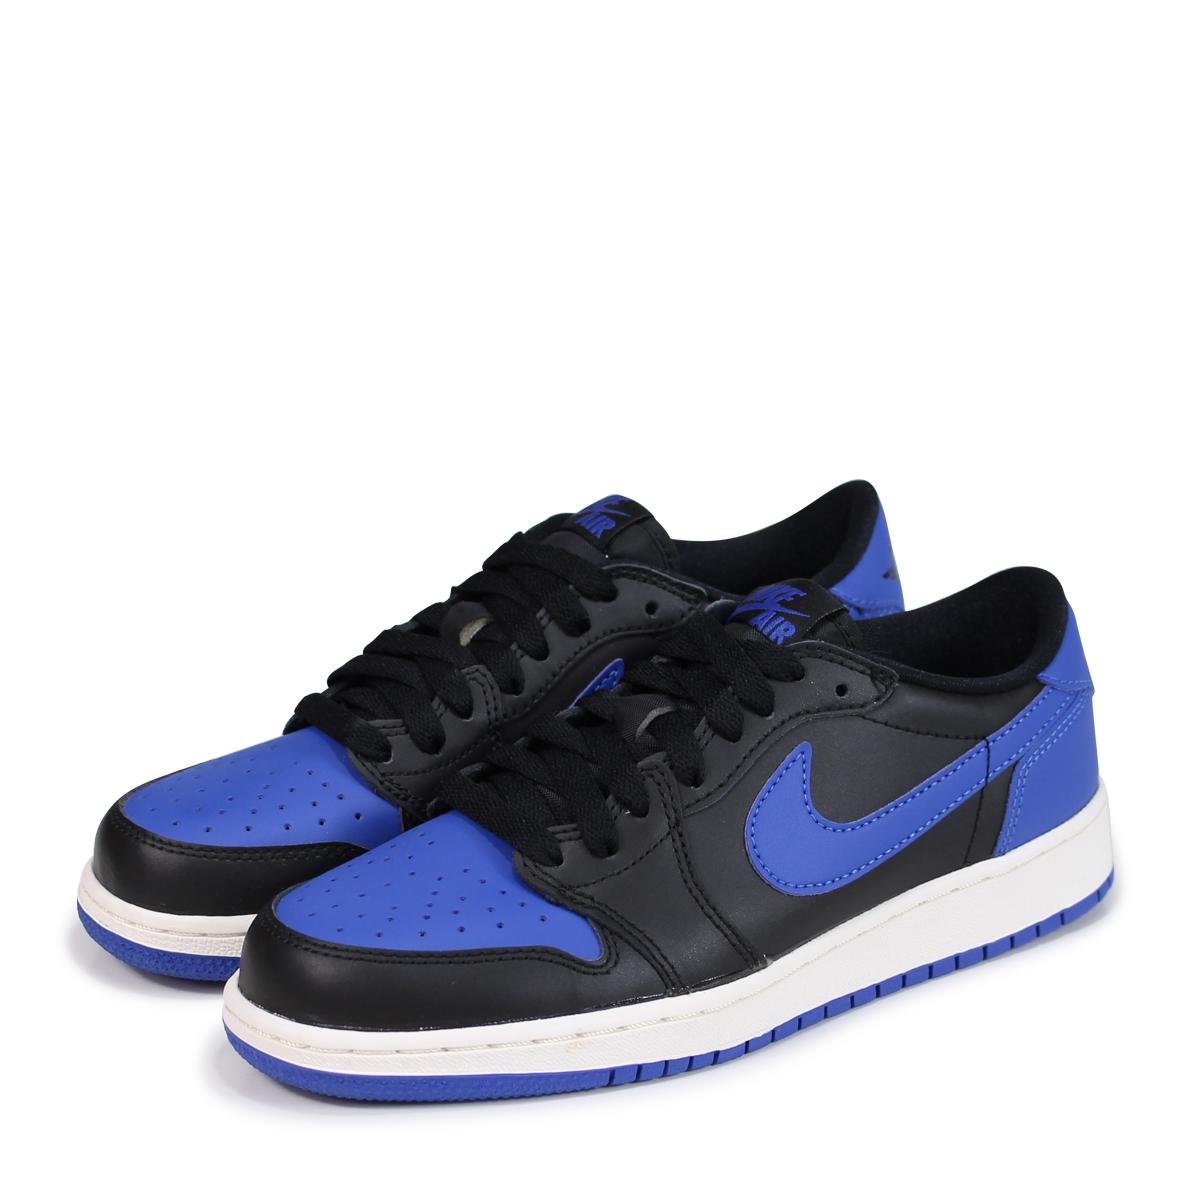 NIKE AIR JORDAN 1 RETRO LOW OG BG Nike Air Jordan 1 nostalgic lady s  sneakers 709 cbe2a8a19